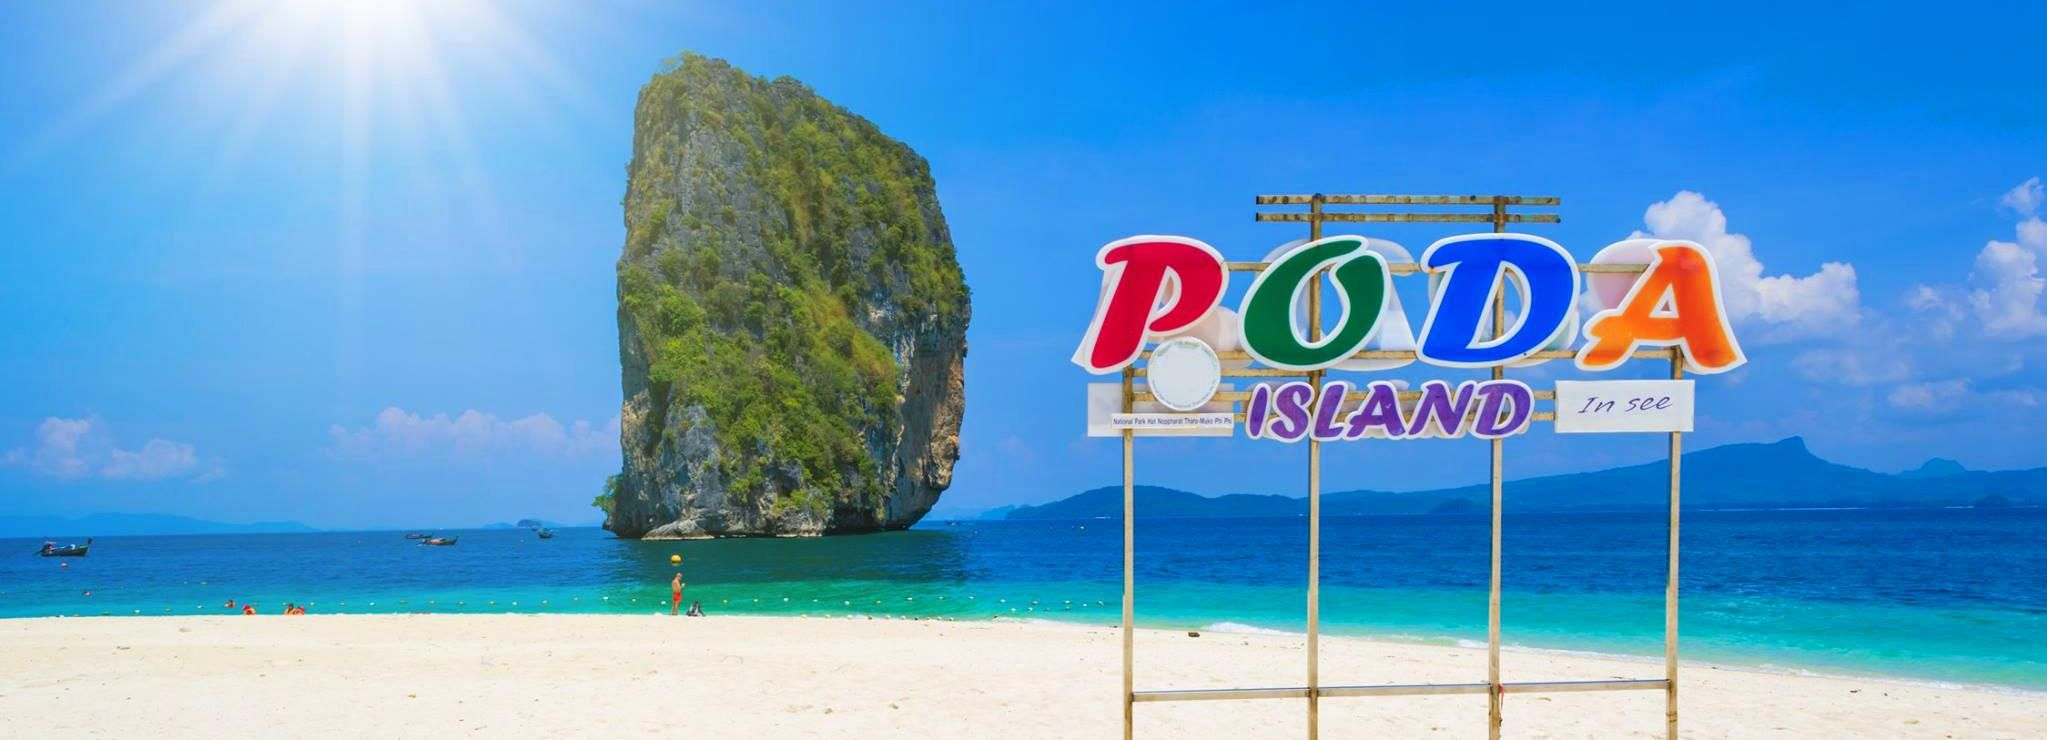 Krabi: 4 Islands Snorkeling Boat Tour